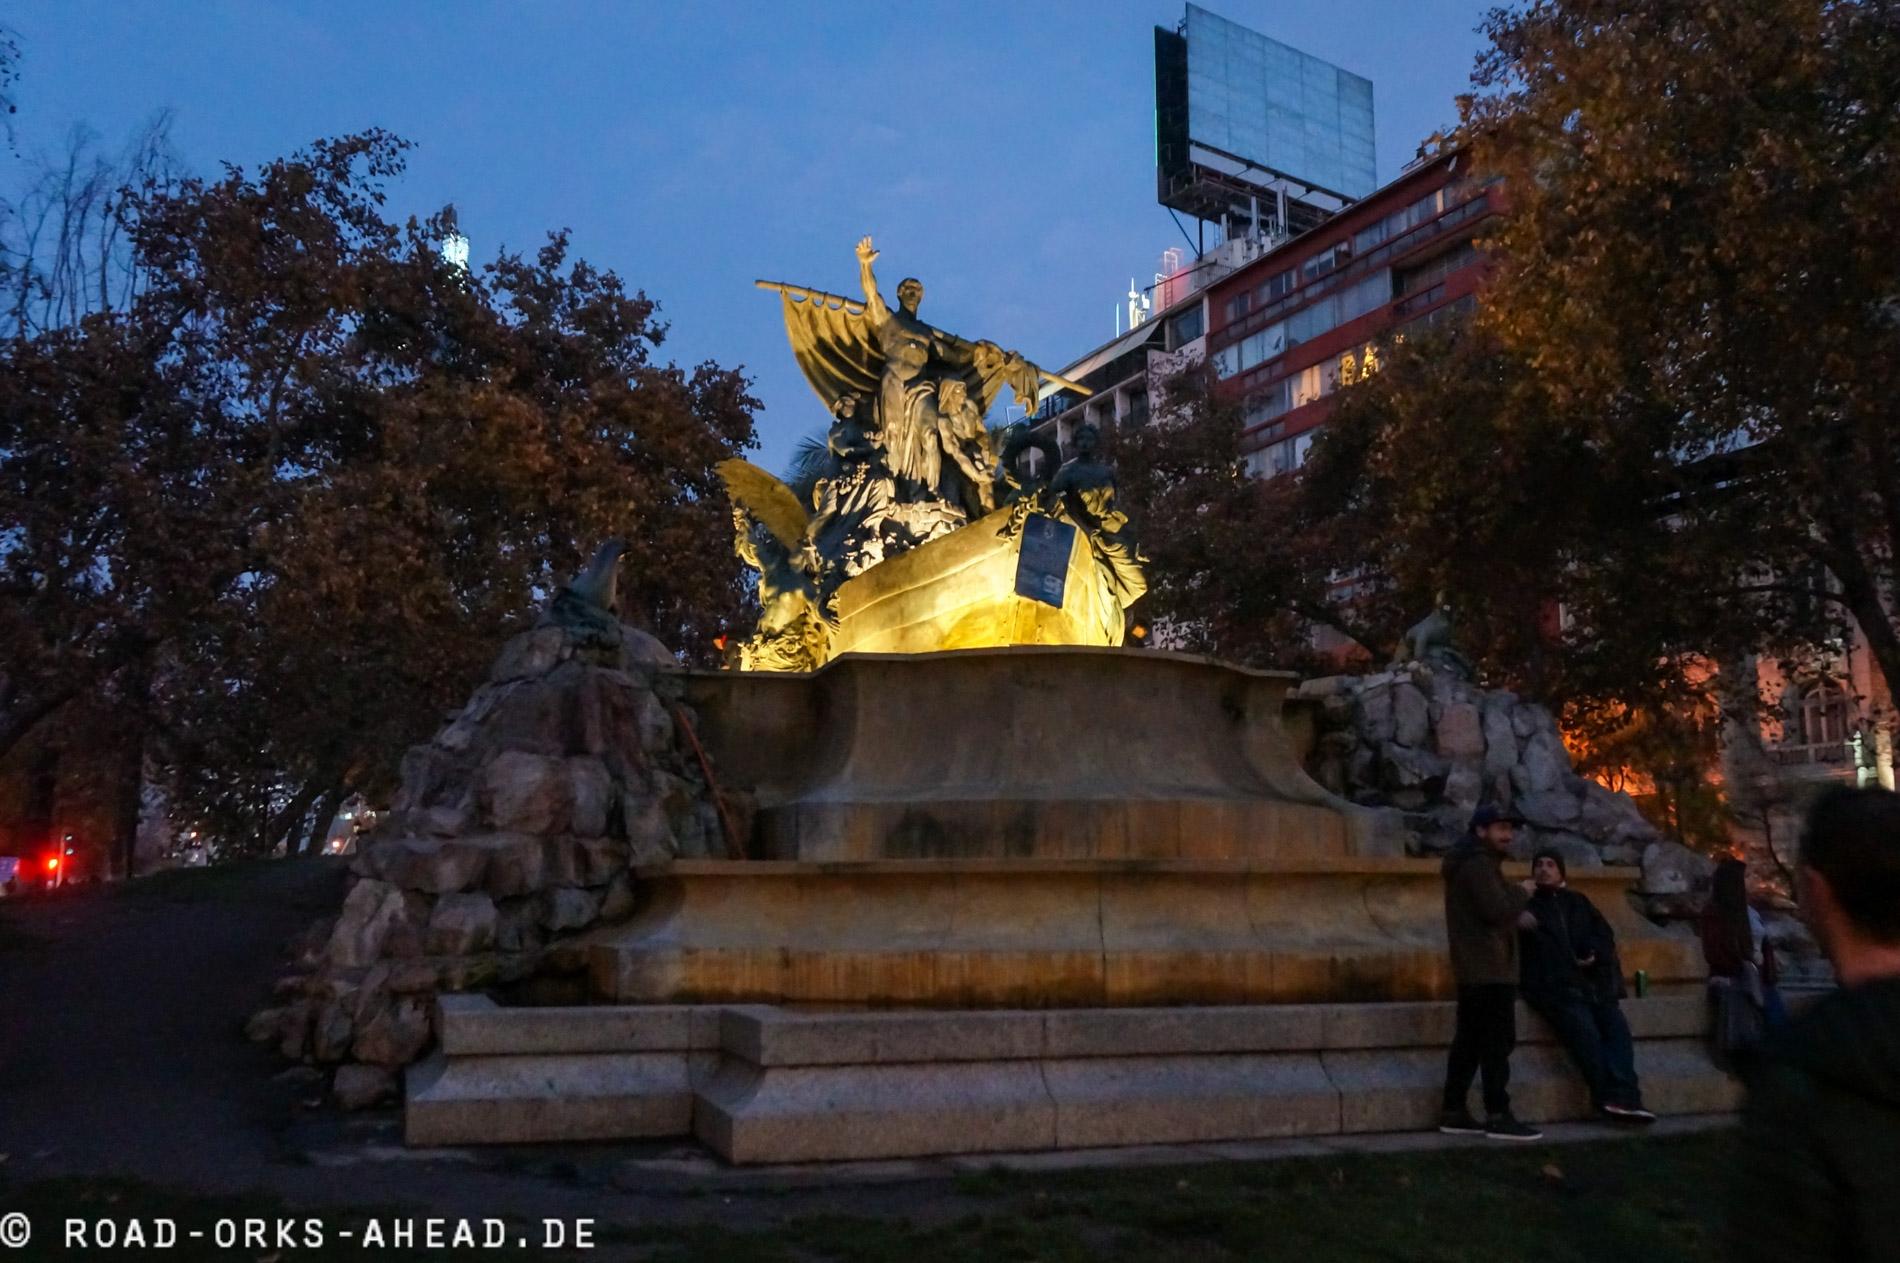 Deutscher Brunnen - Geschenk an Chile